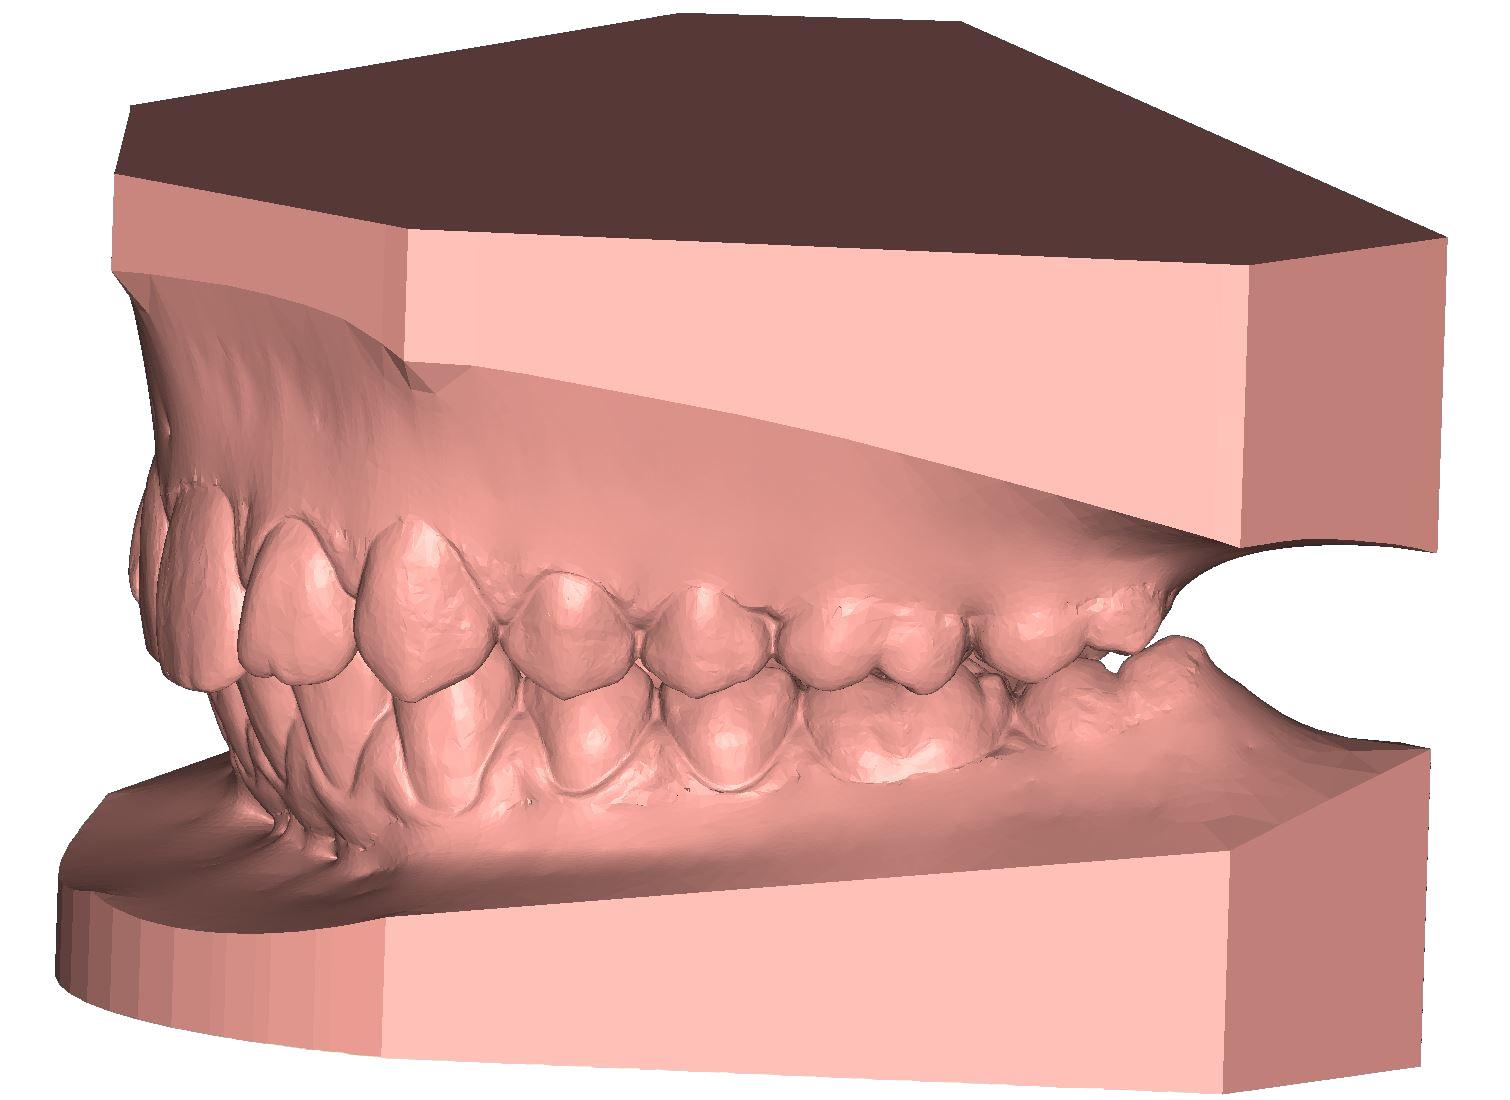 ArchBase study base 3D dental model DeltaFace